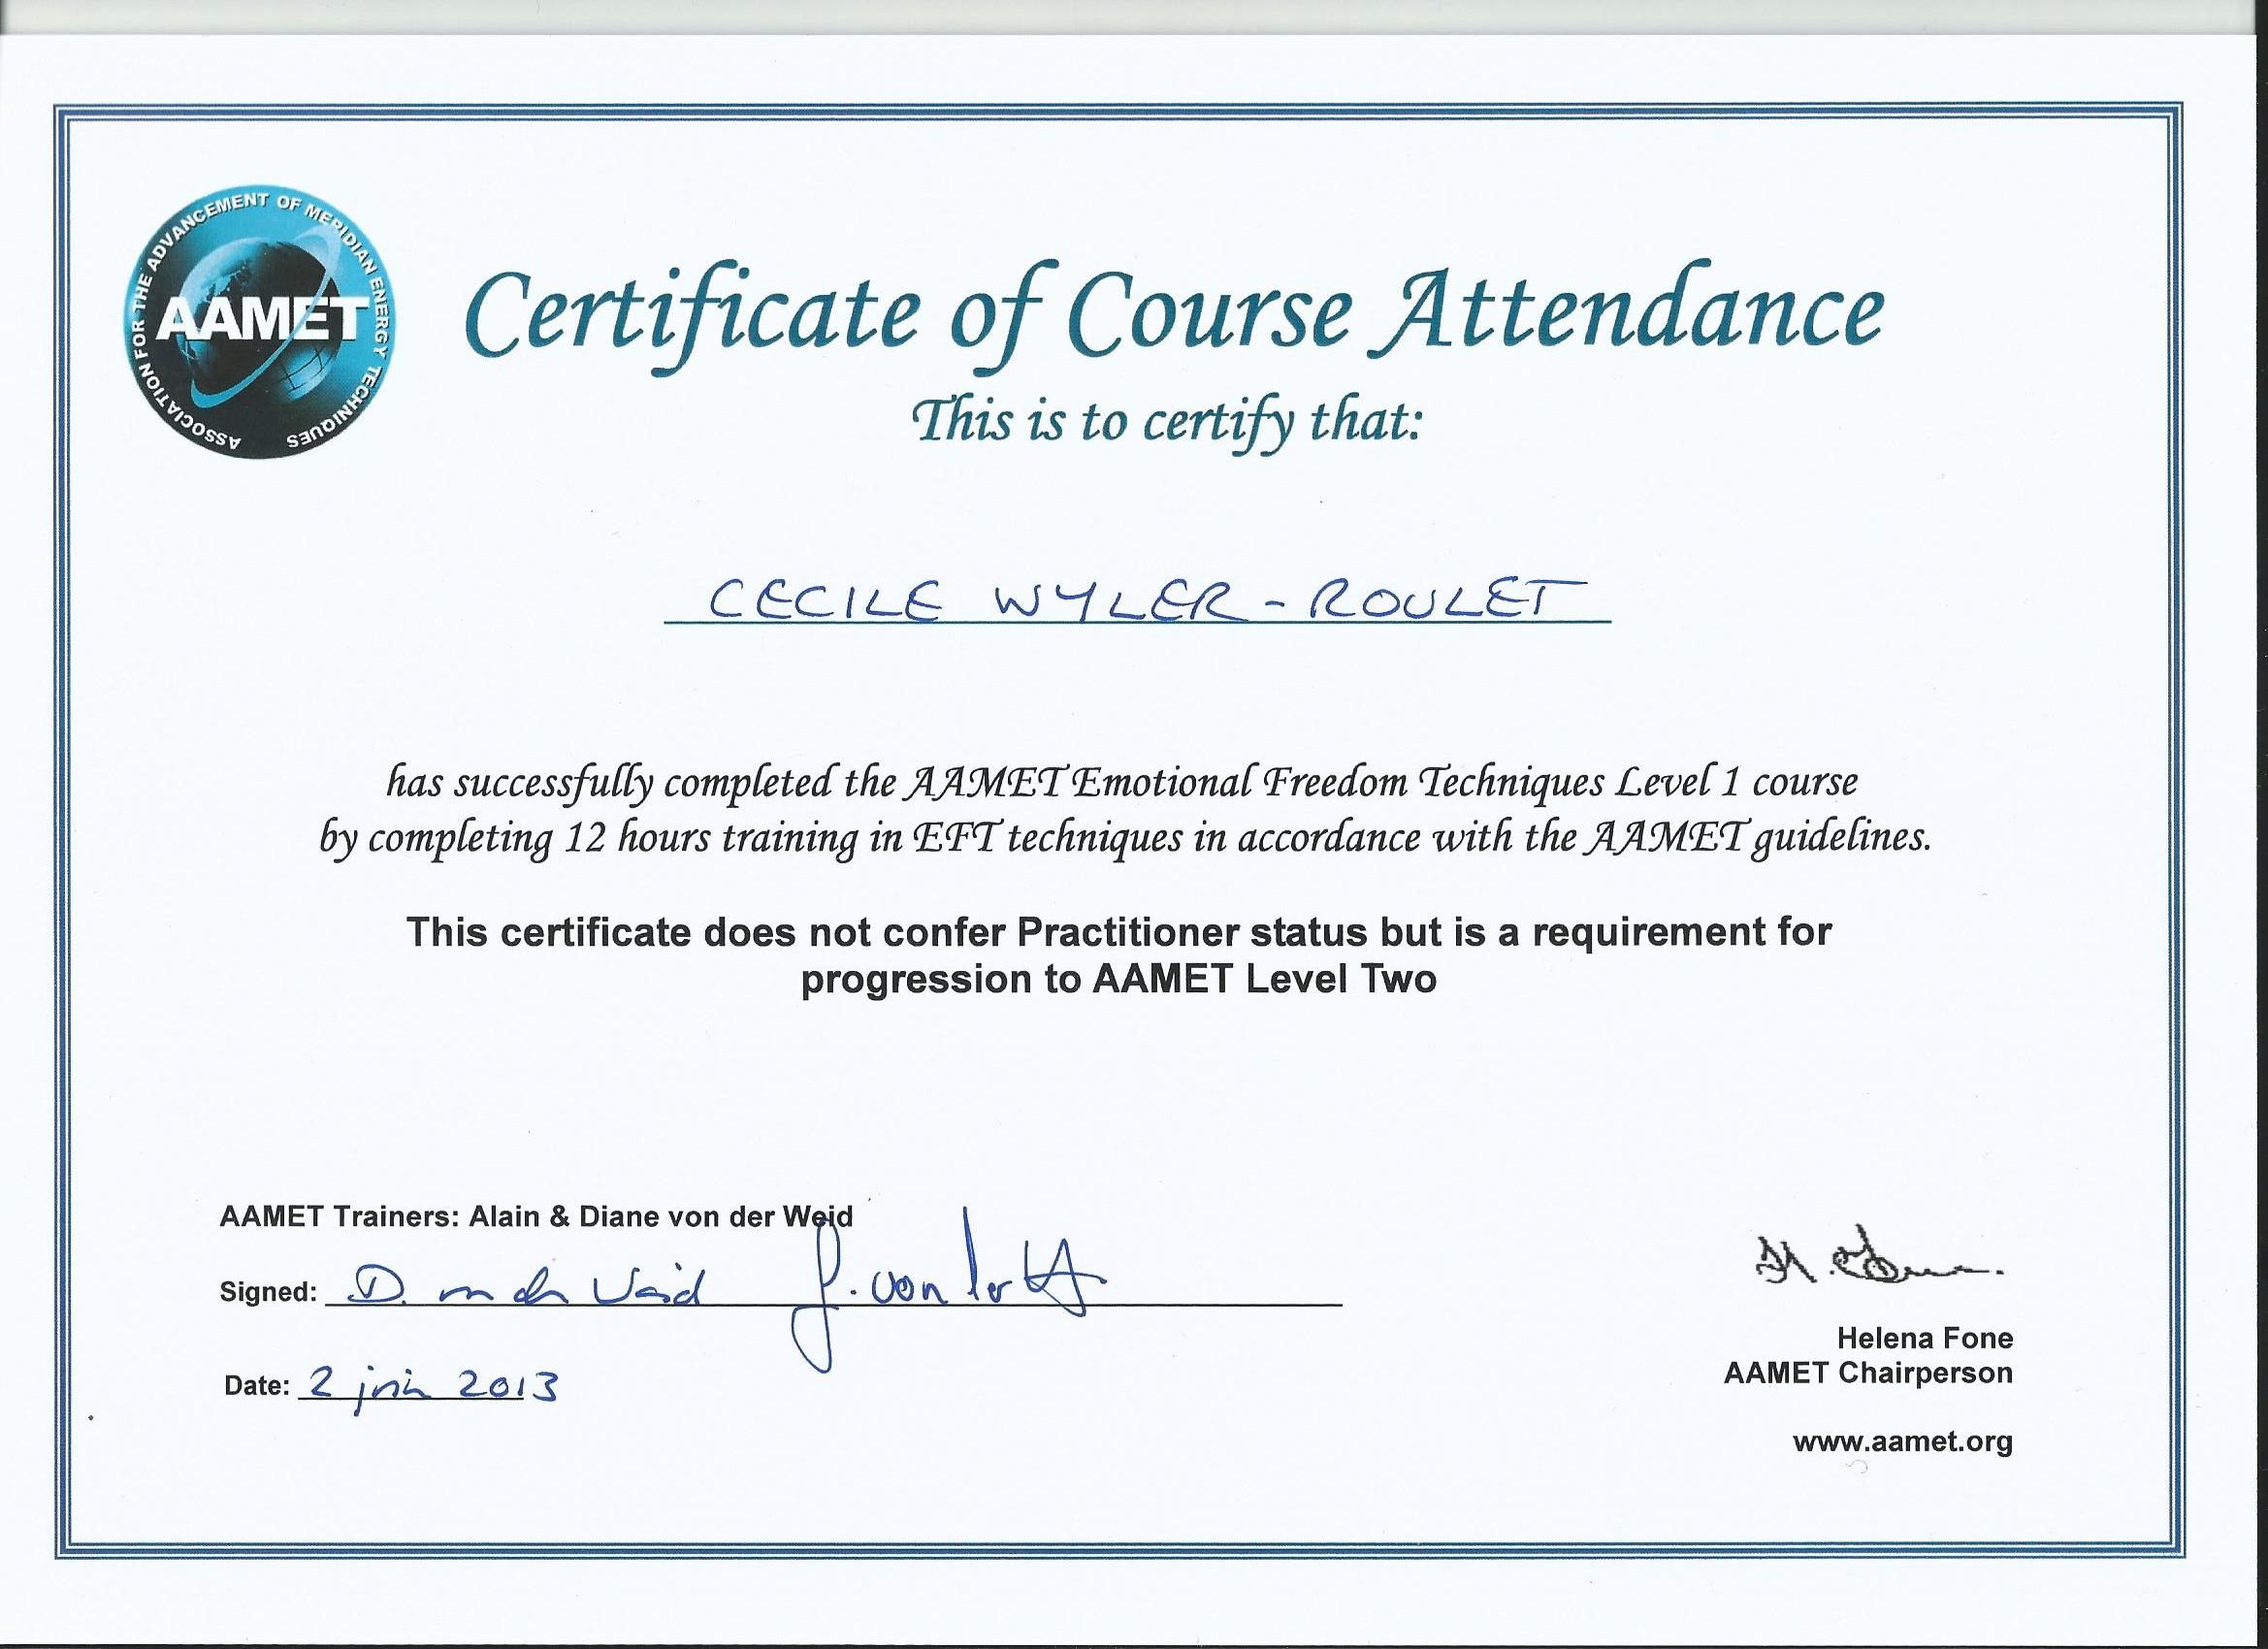 EFT 1 - Course Attendance